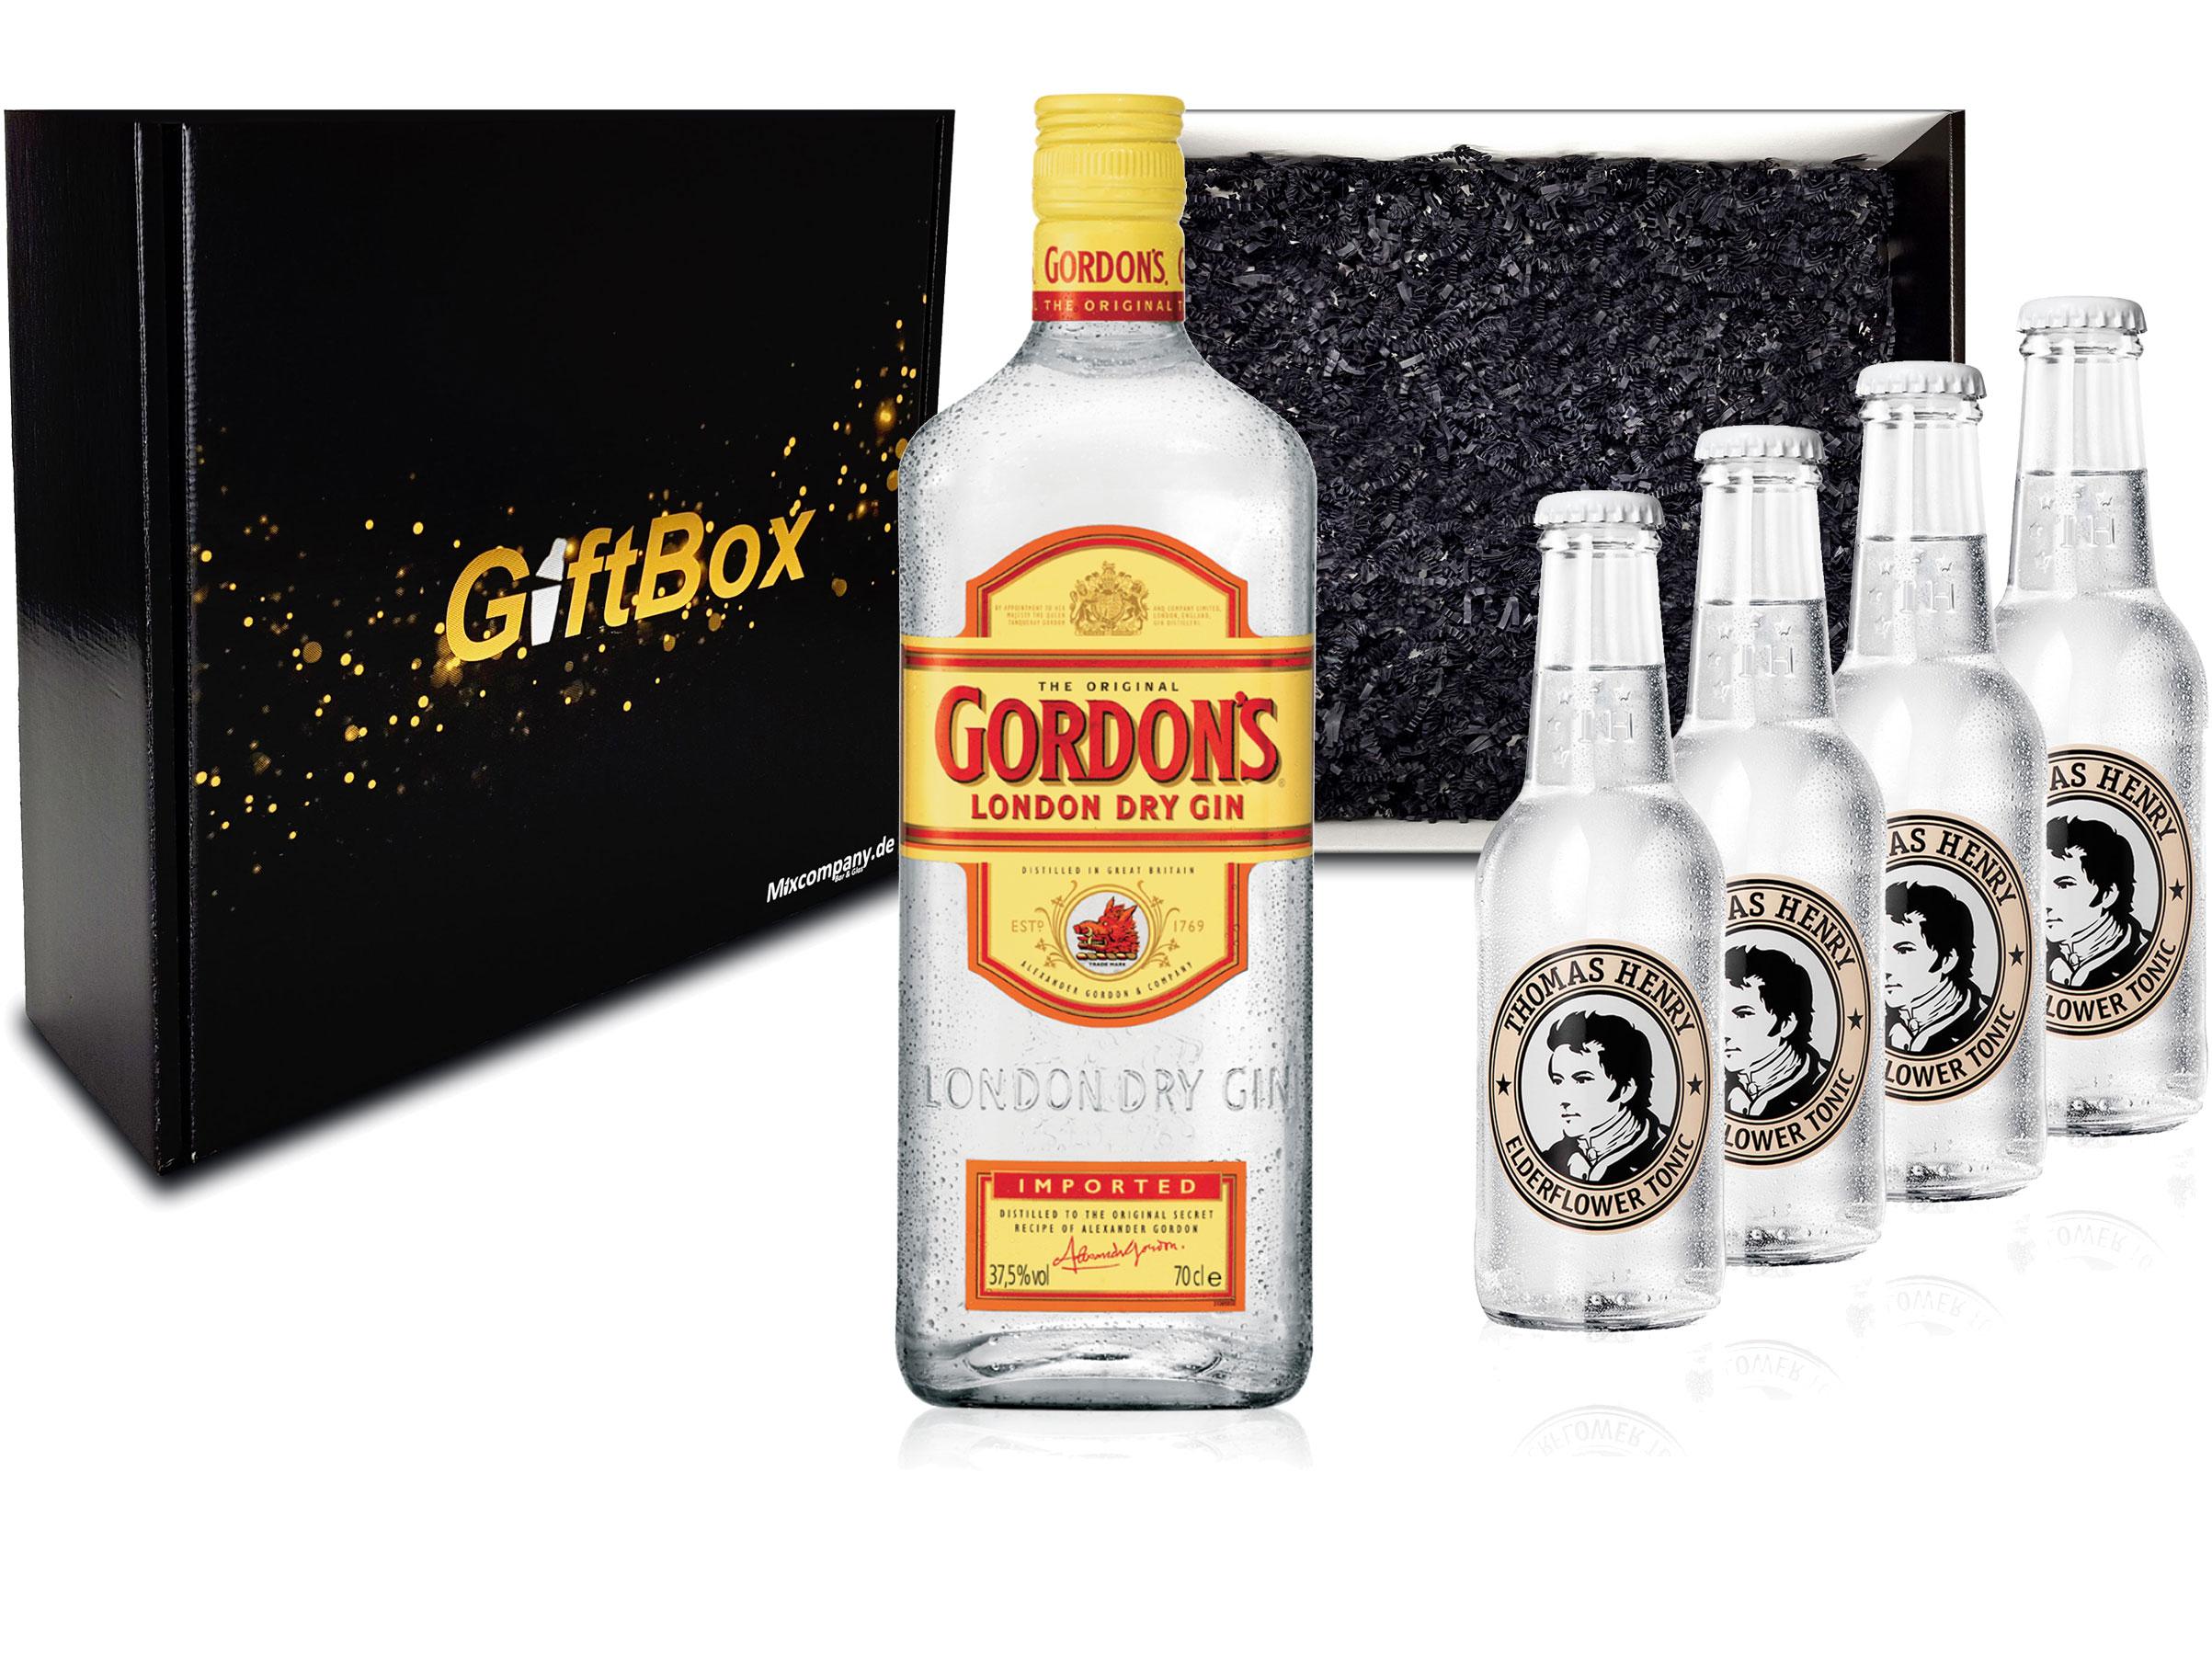 Gin Tonic Giftbox Geschenkset - Gordons Gin 0,7l 700ml (37,5% Vol) + 4x Thomas Henry Elderflower Tonic Water 200ml inkl. Pfand MEHRWEG + Geschenkverpackung